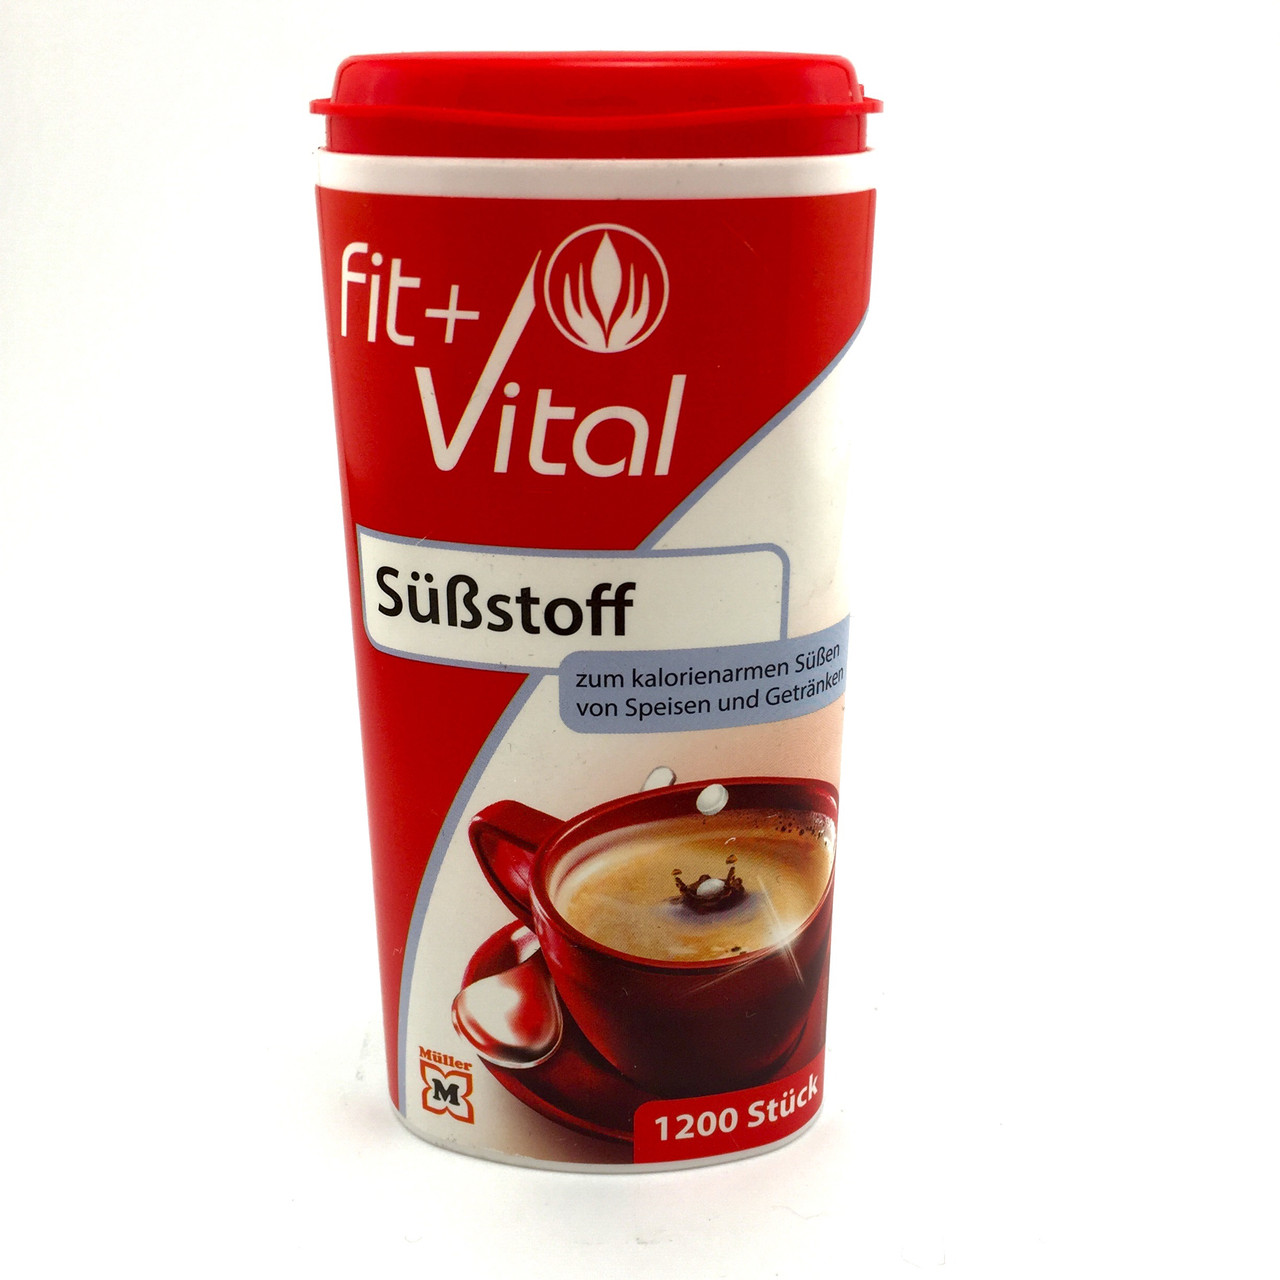 Fit Vital заменитель сахара Susstoff Германия 1200шт